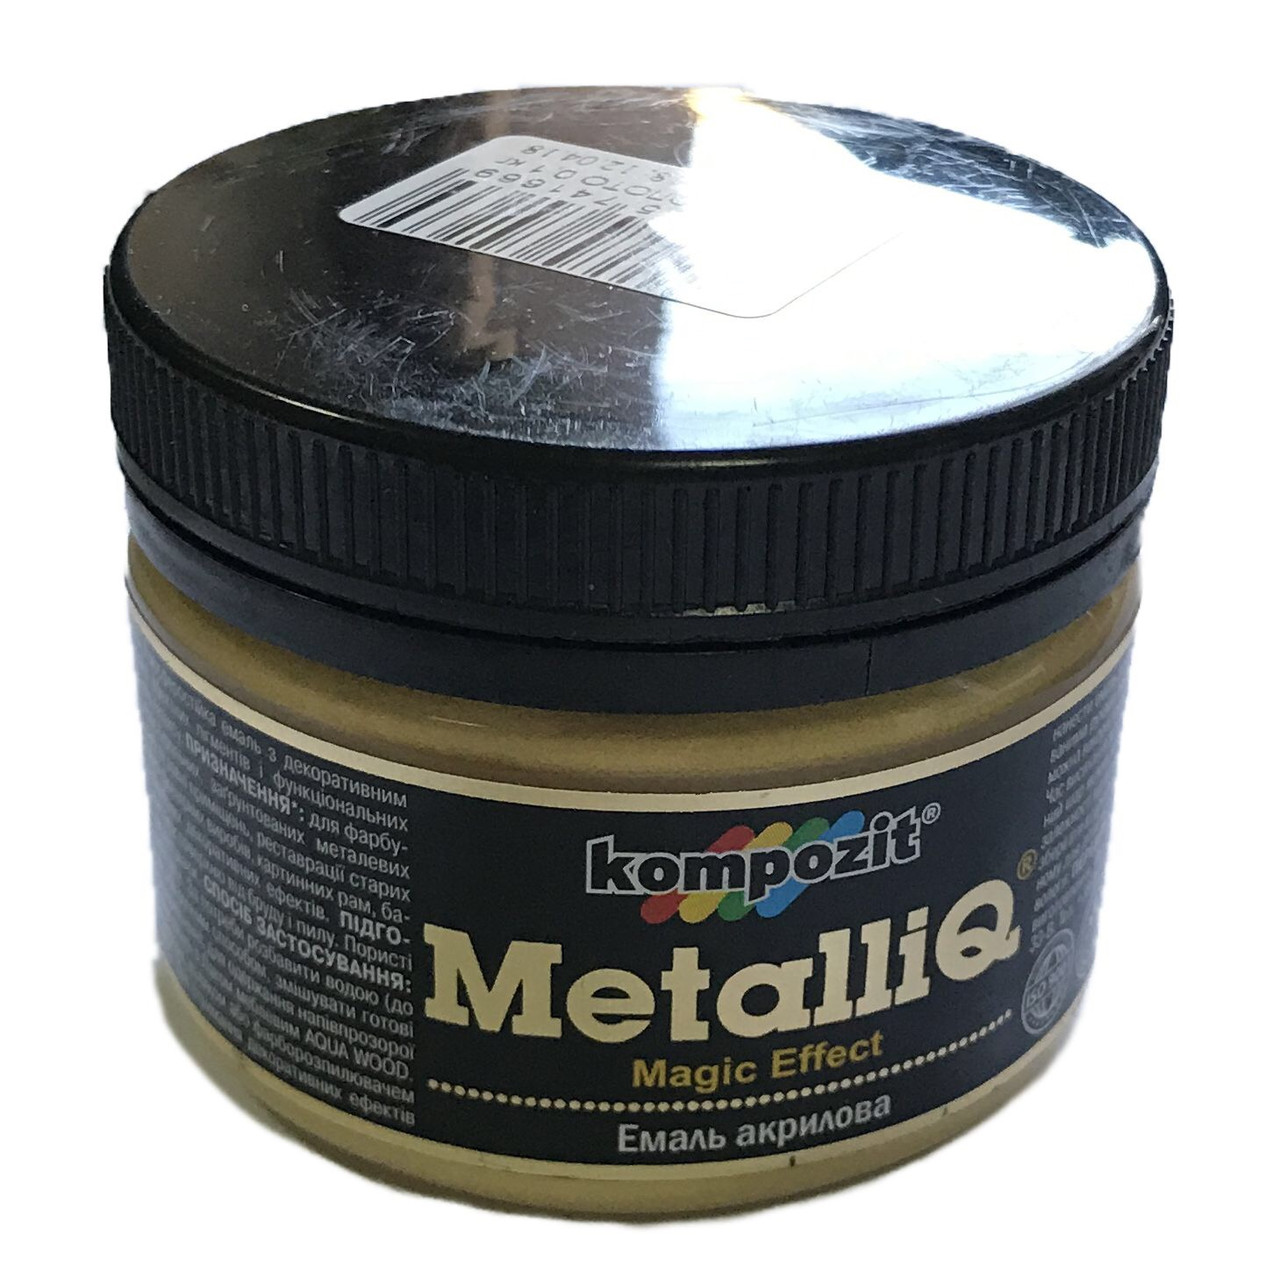 Емаль акрилова Kompozit MetalliQ 0,1кг Золото